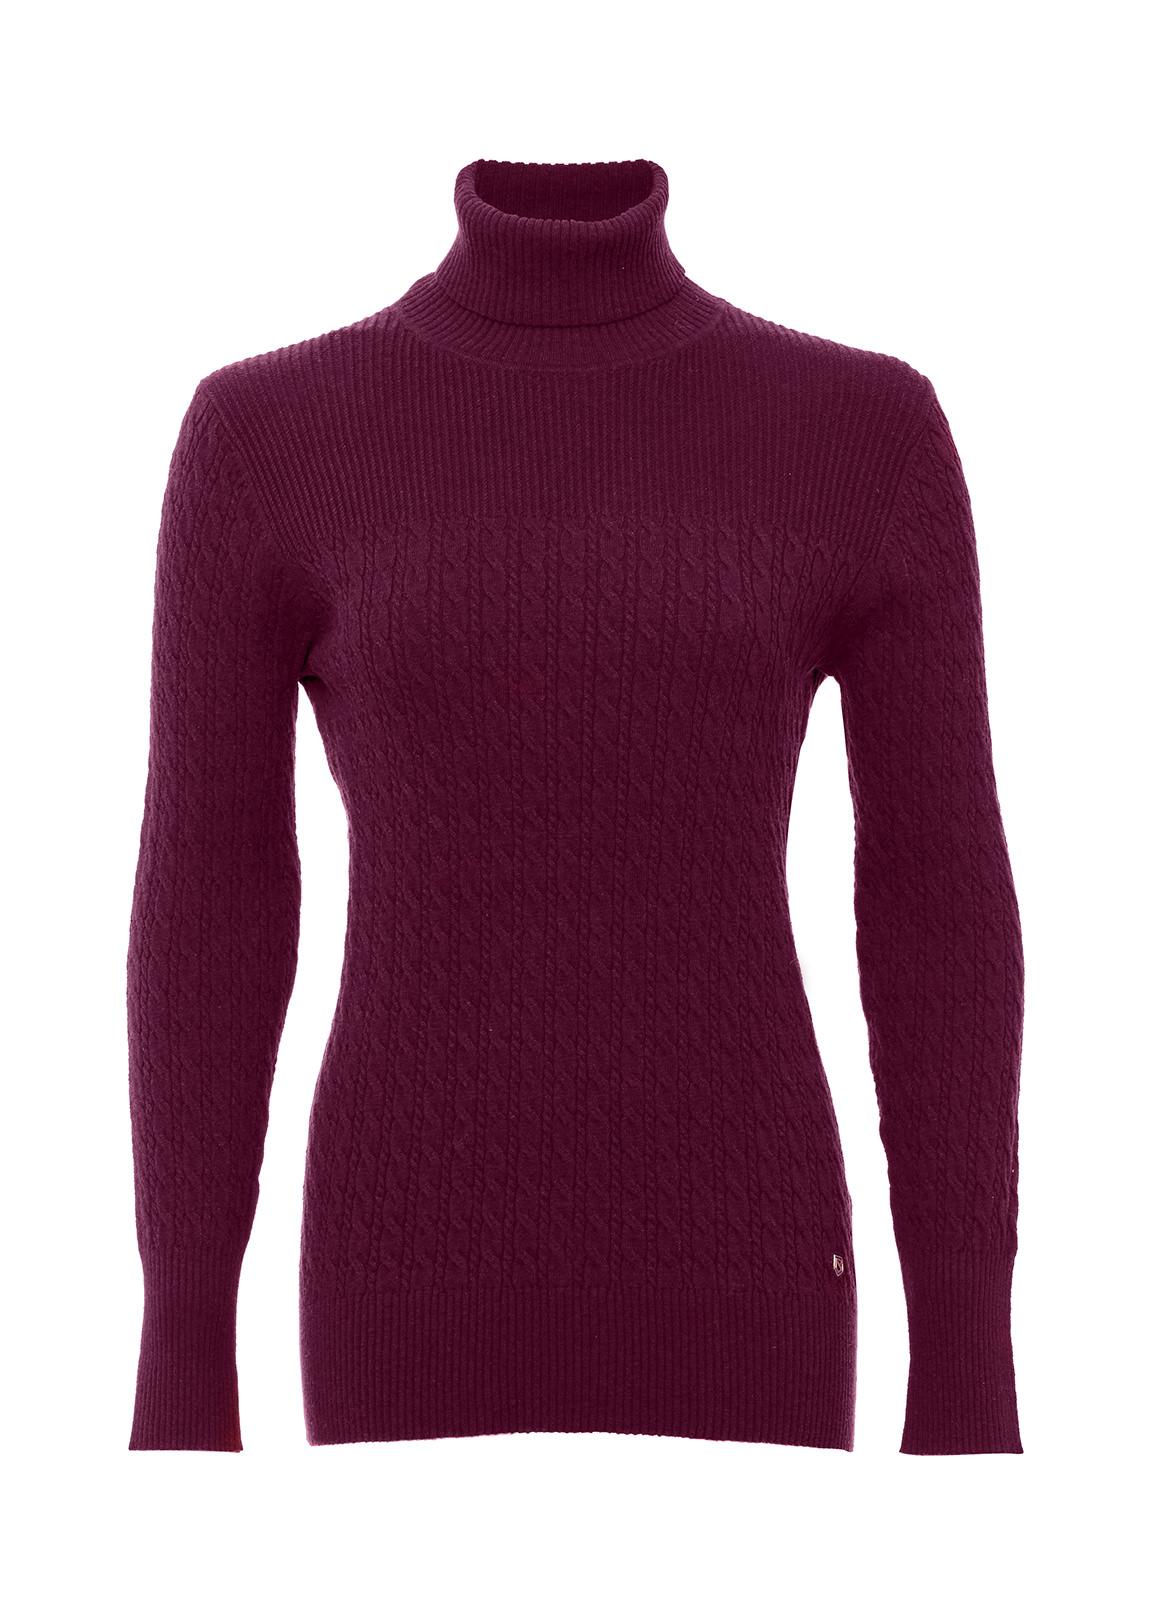 Dubarry_ Boylan Polo Neck Sweater - Malbec_Image_2